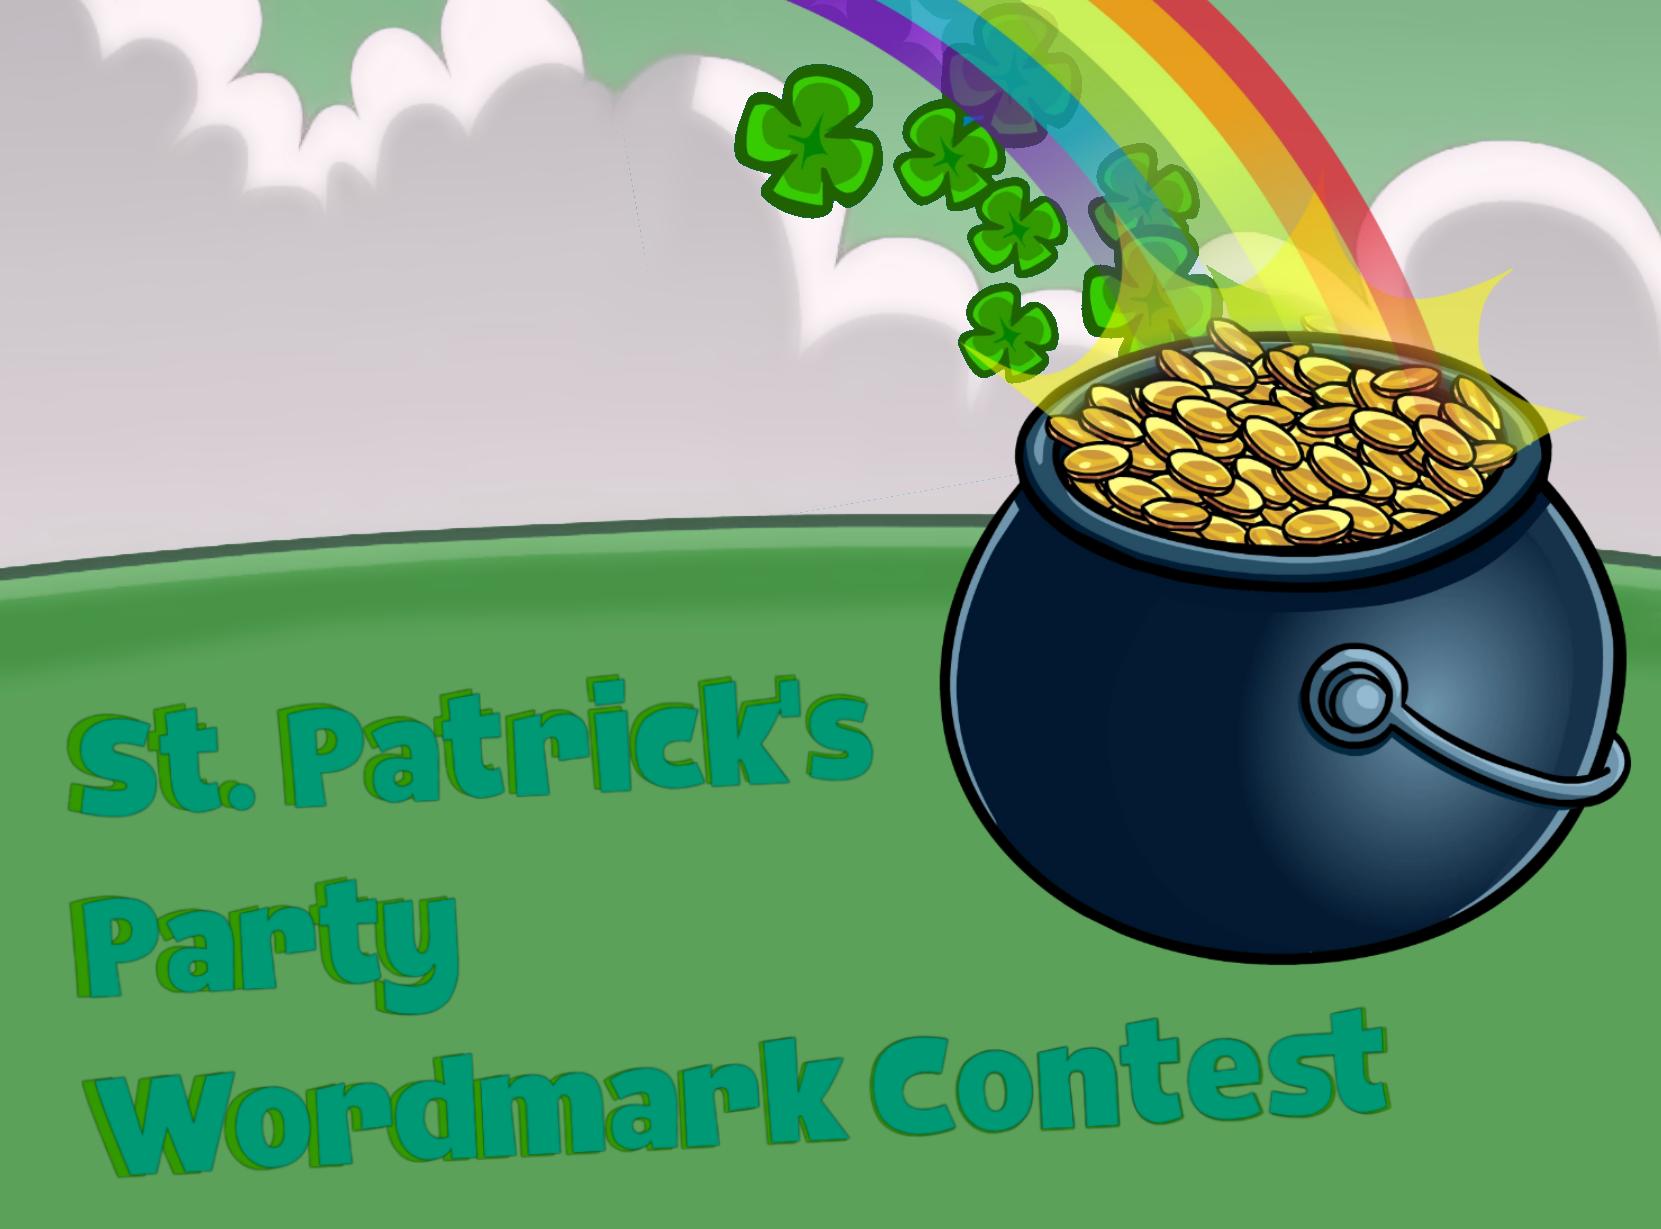 Lataus/St. Patrick's Parade Wordmark Contest!